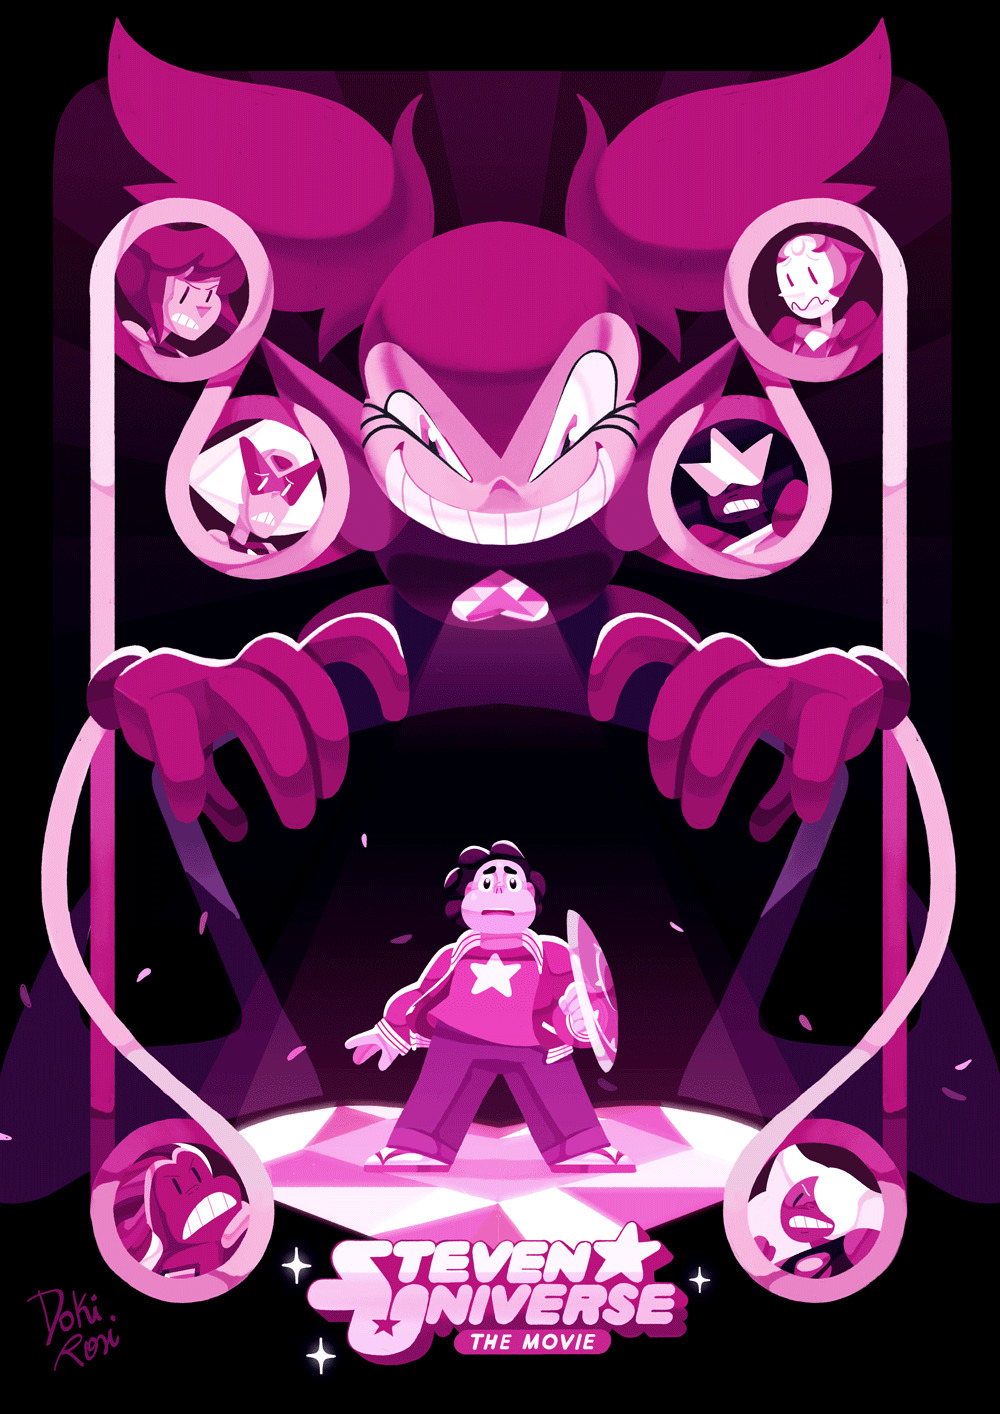 Steven Universe the Movie Poster